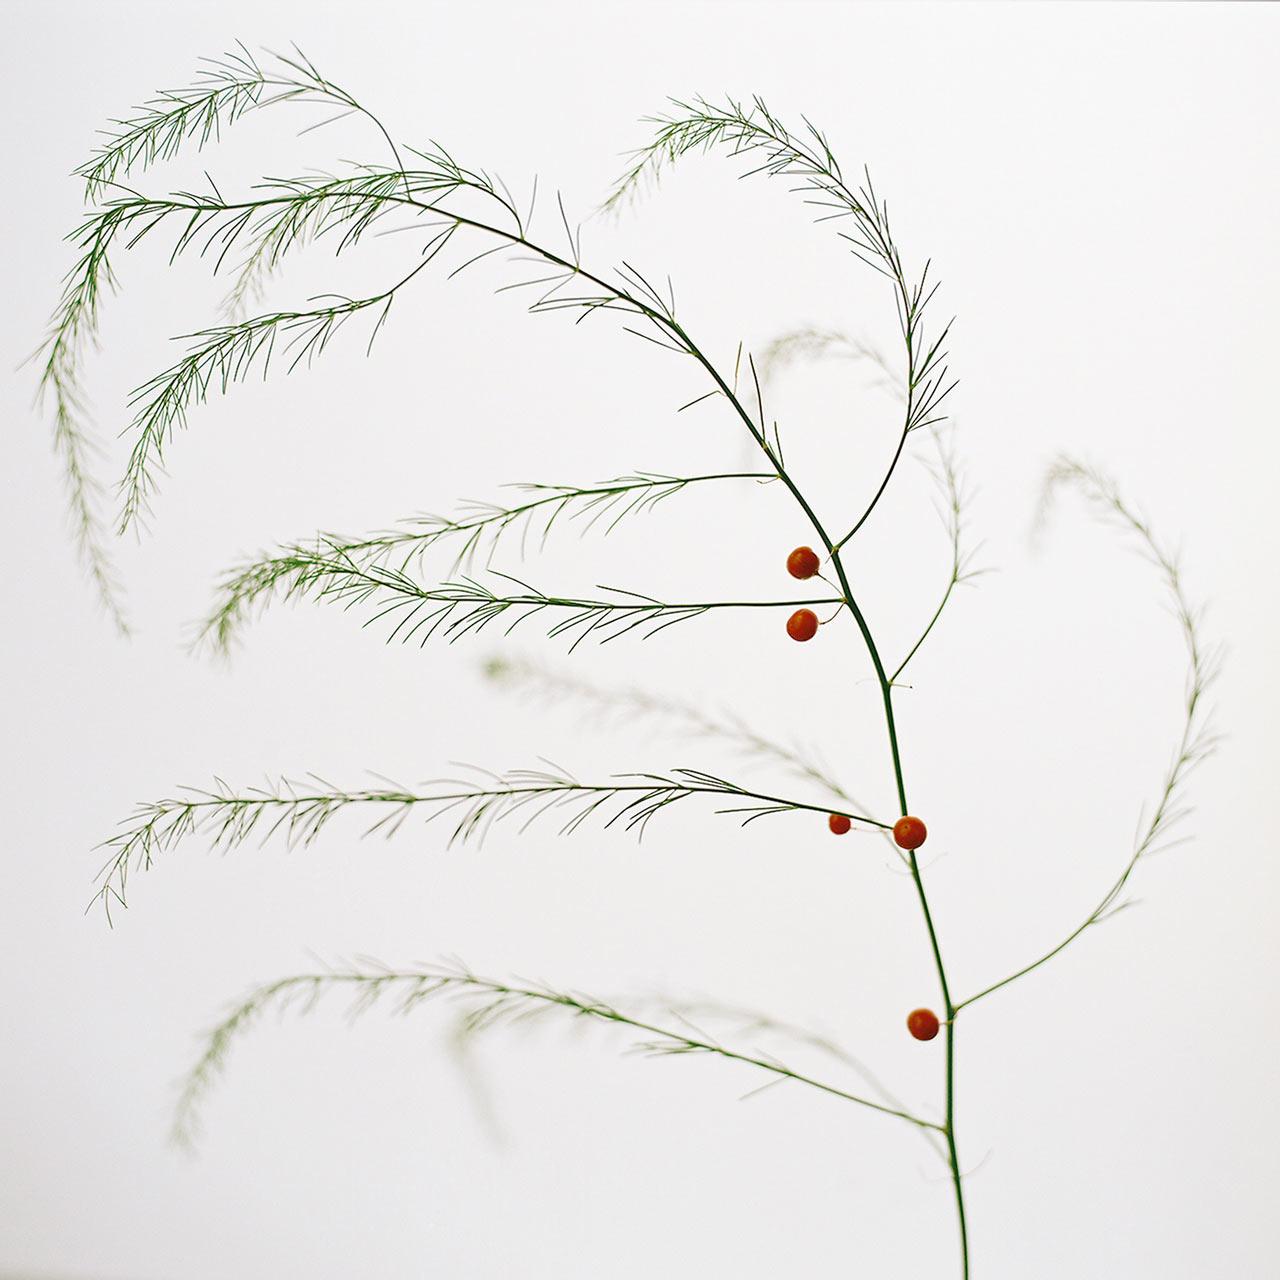 Decon-Designtex-10-9_Wild-Asparagus_S.White